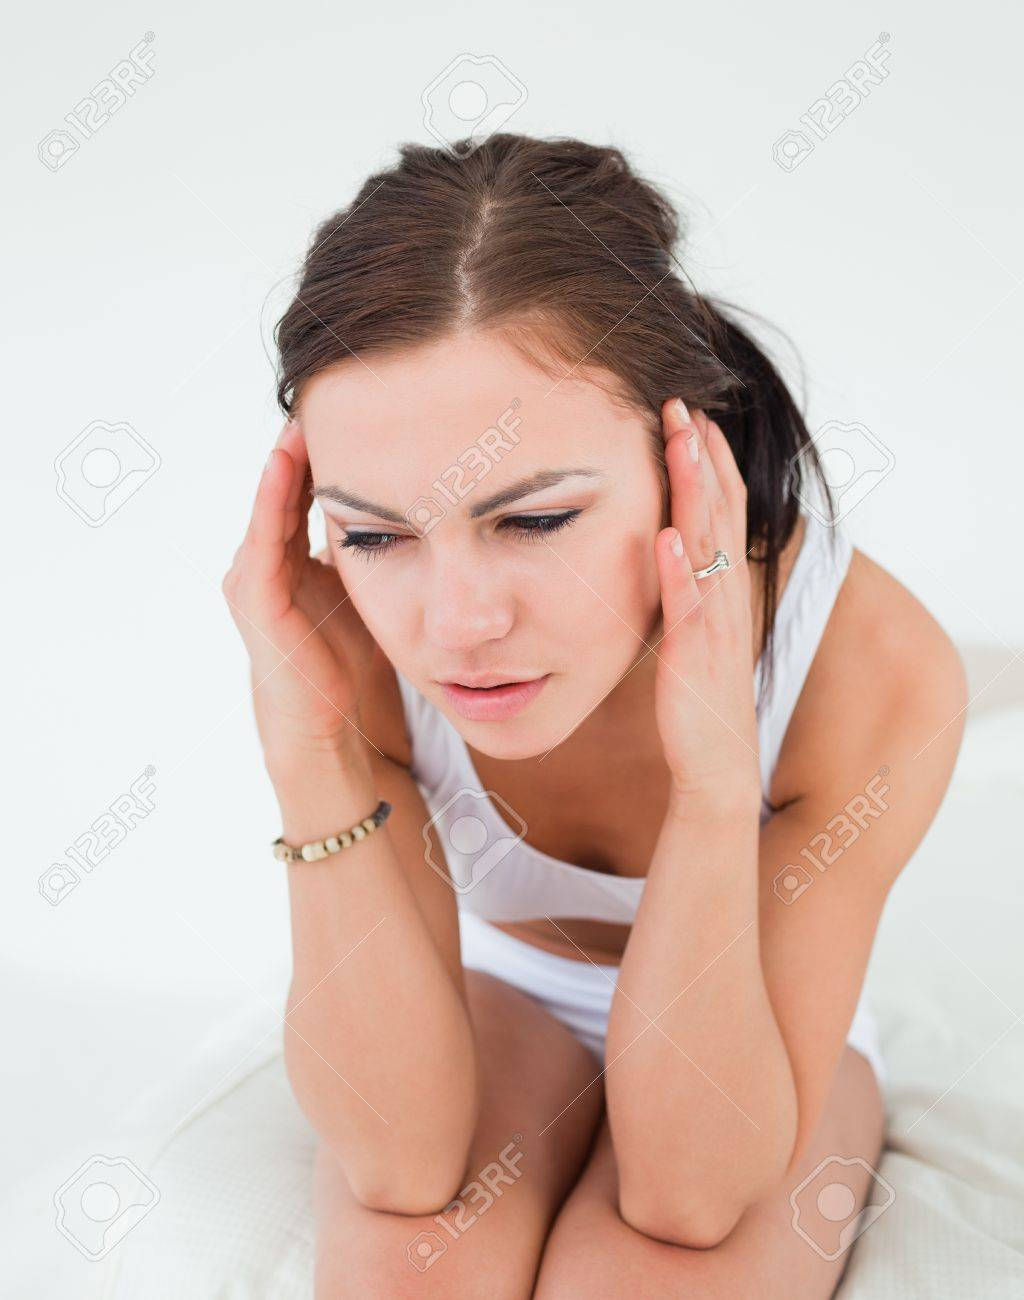 Cute brunette having a headache against a white background Stock Photo - 10071428